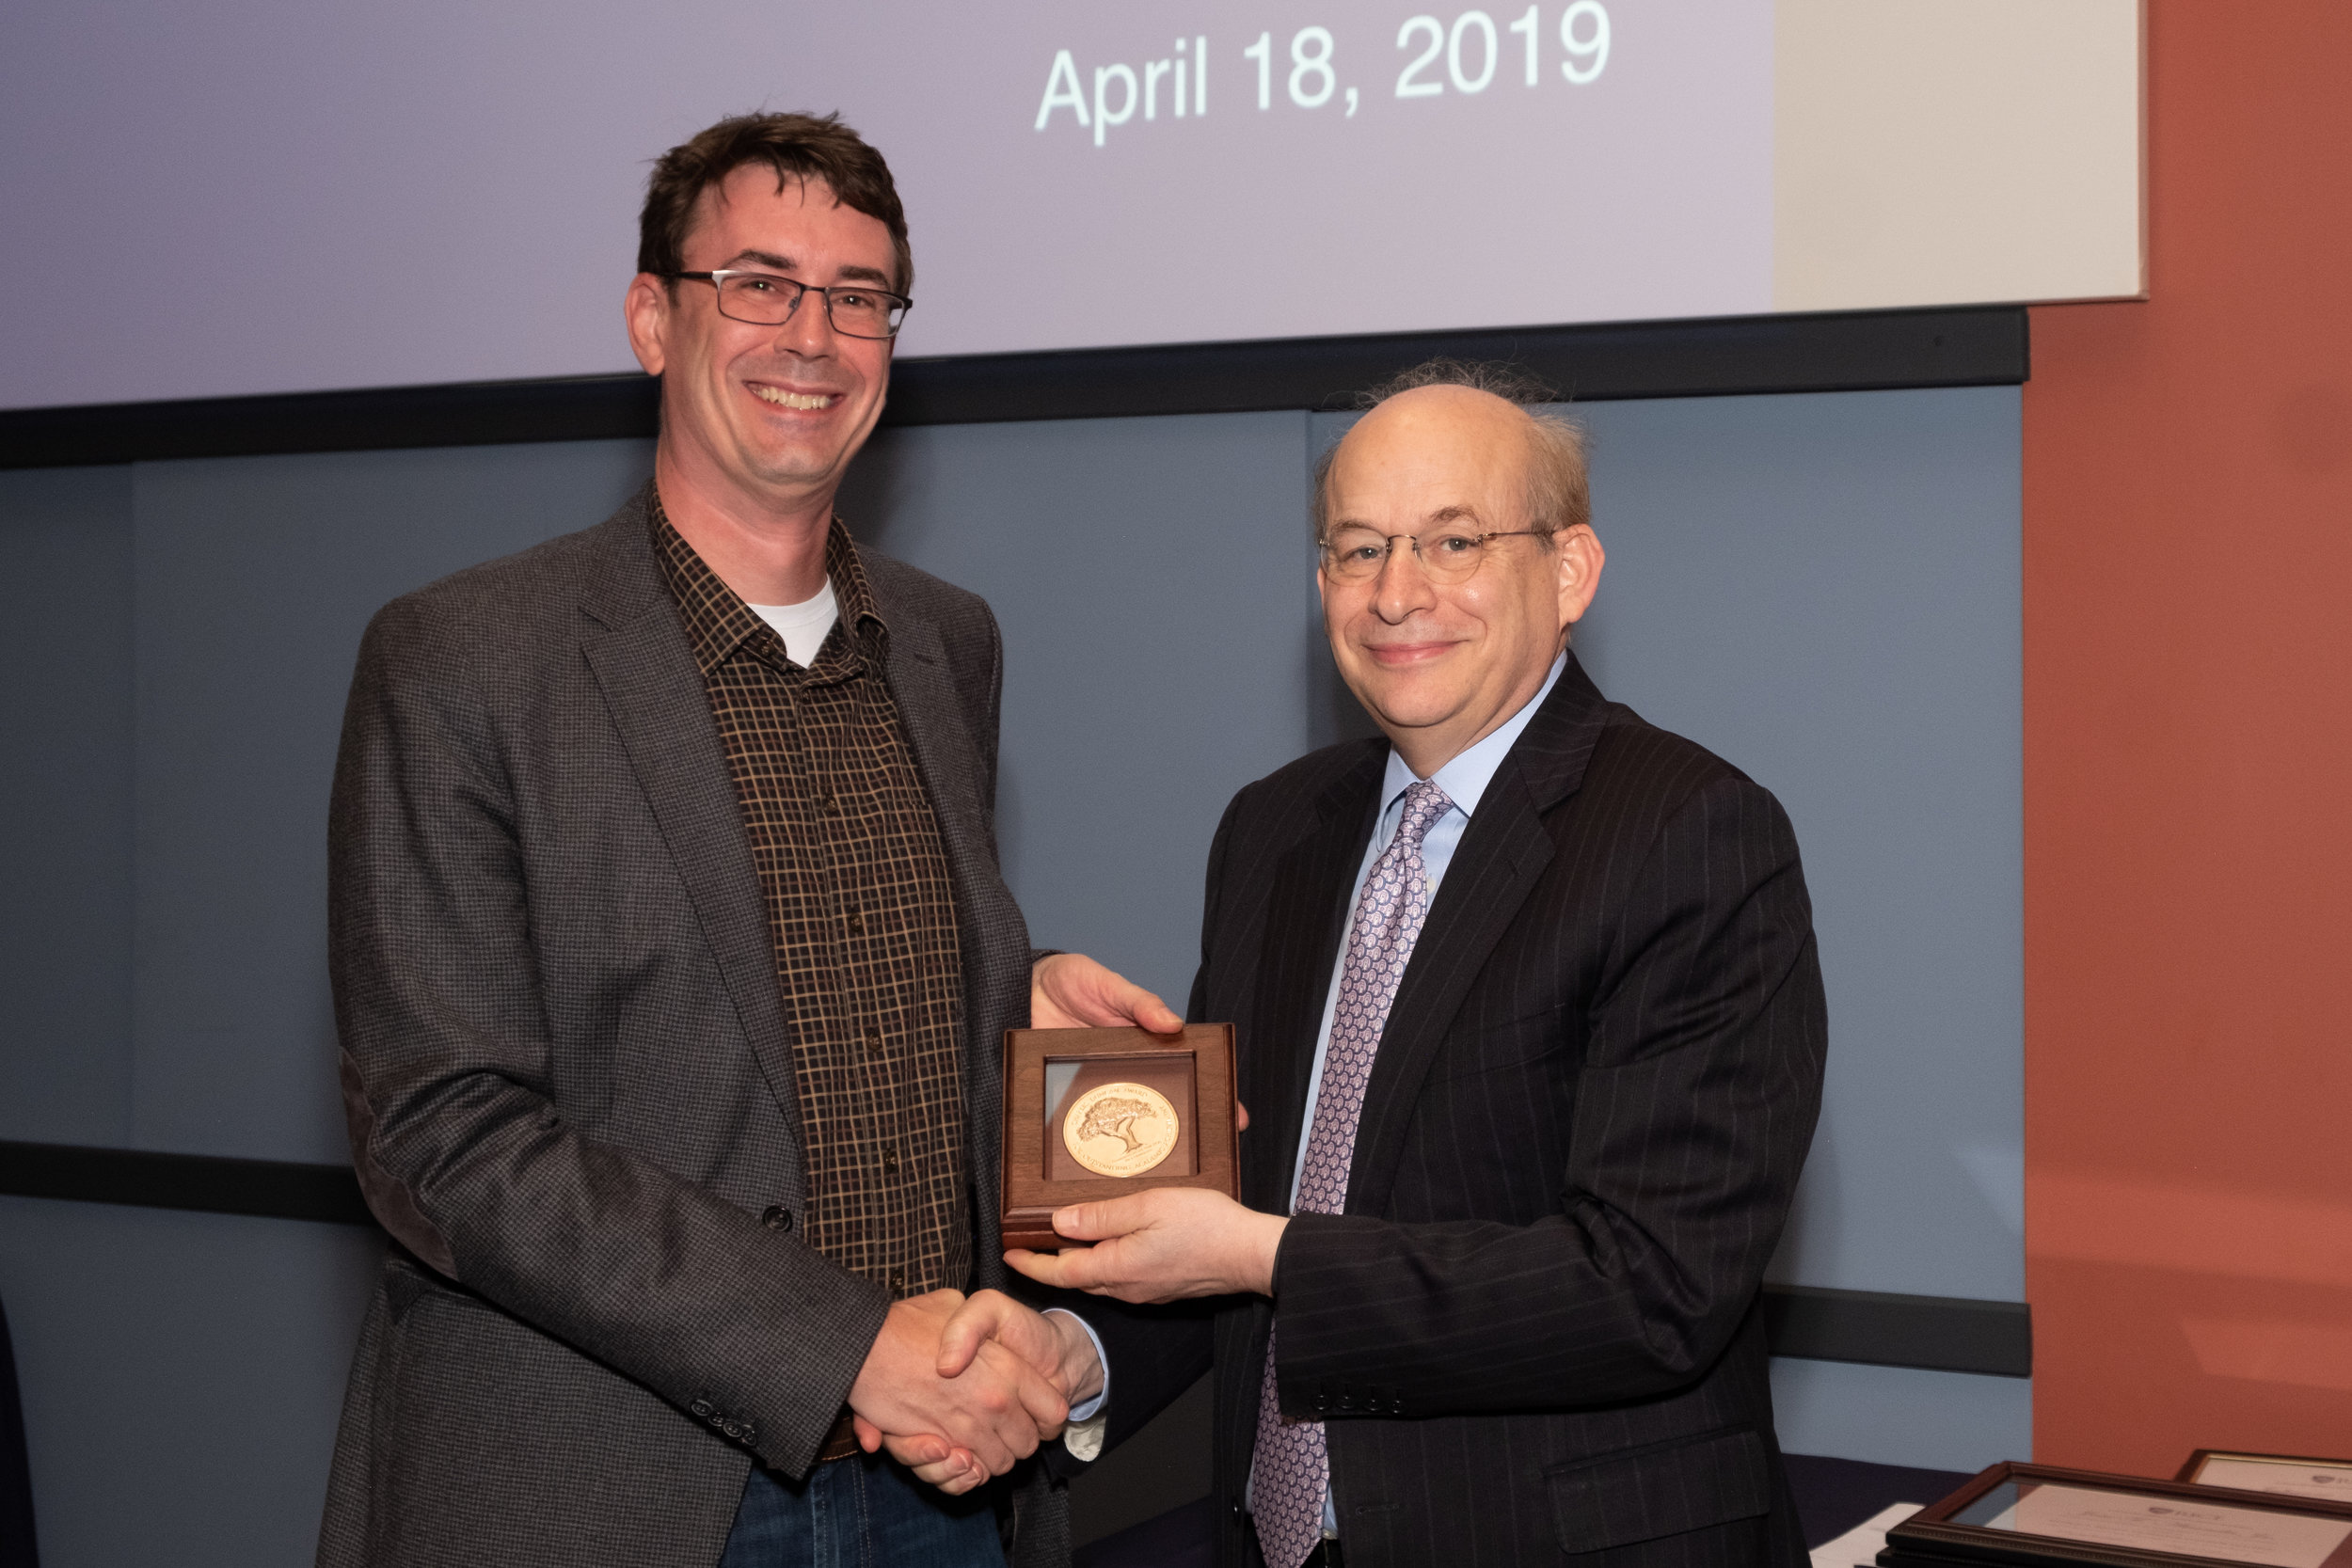 President Leebron & Matthew Bennett, Charles W. Duncan Achievement Award for Outstanding Faculty